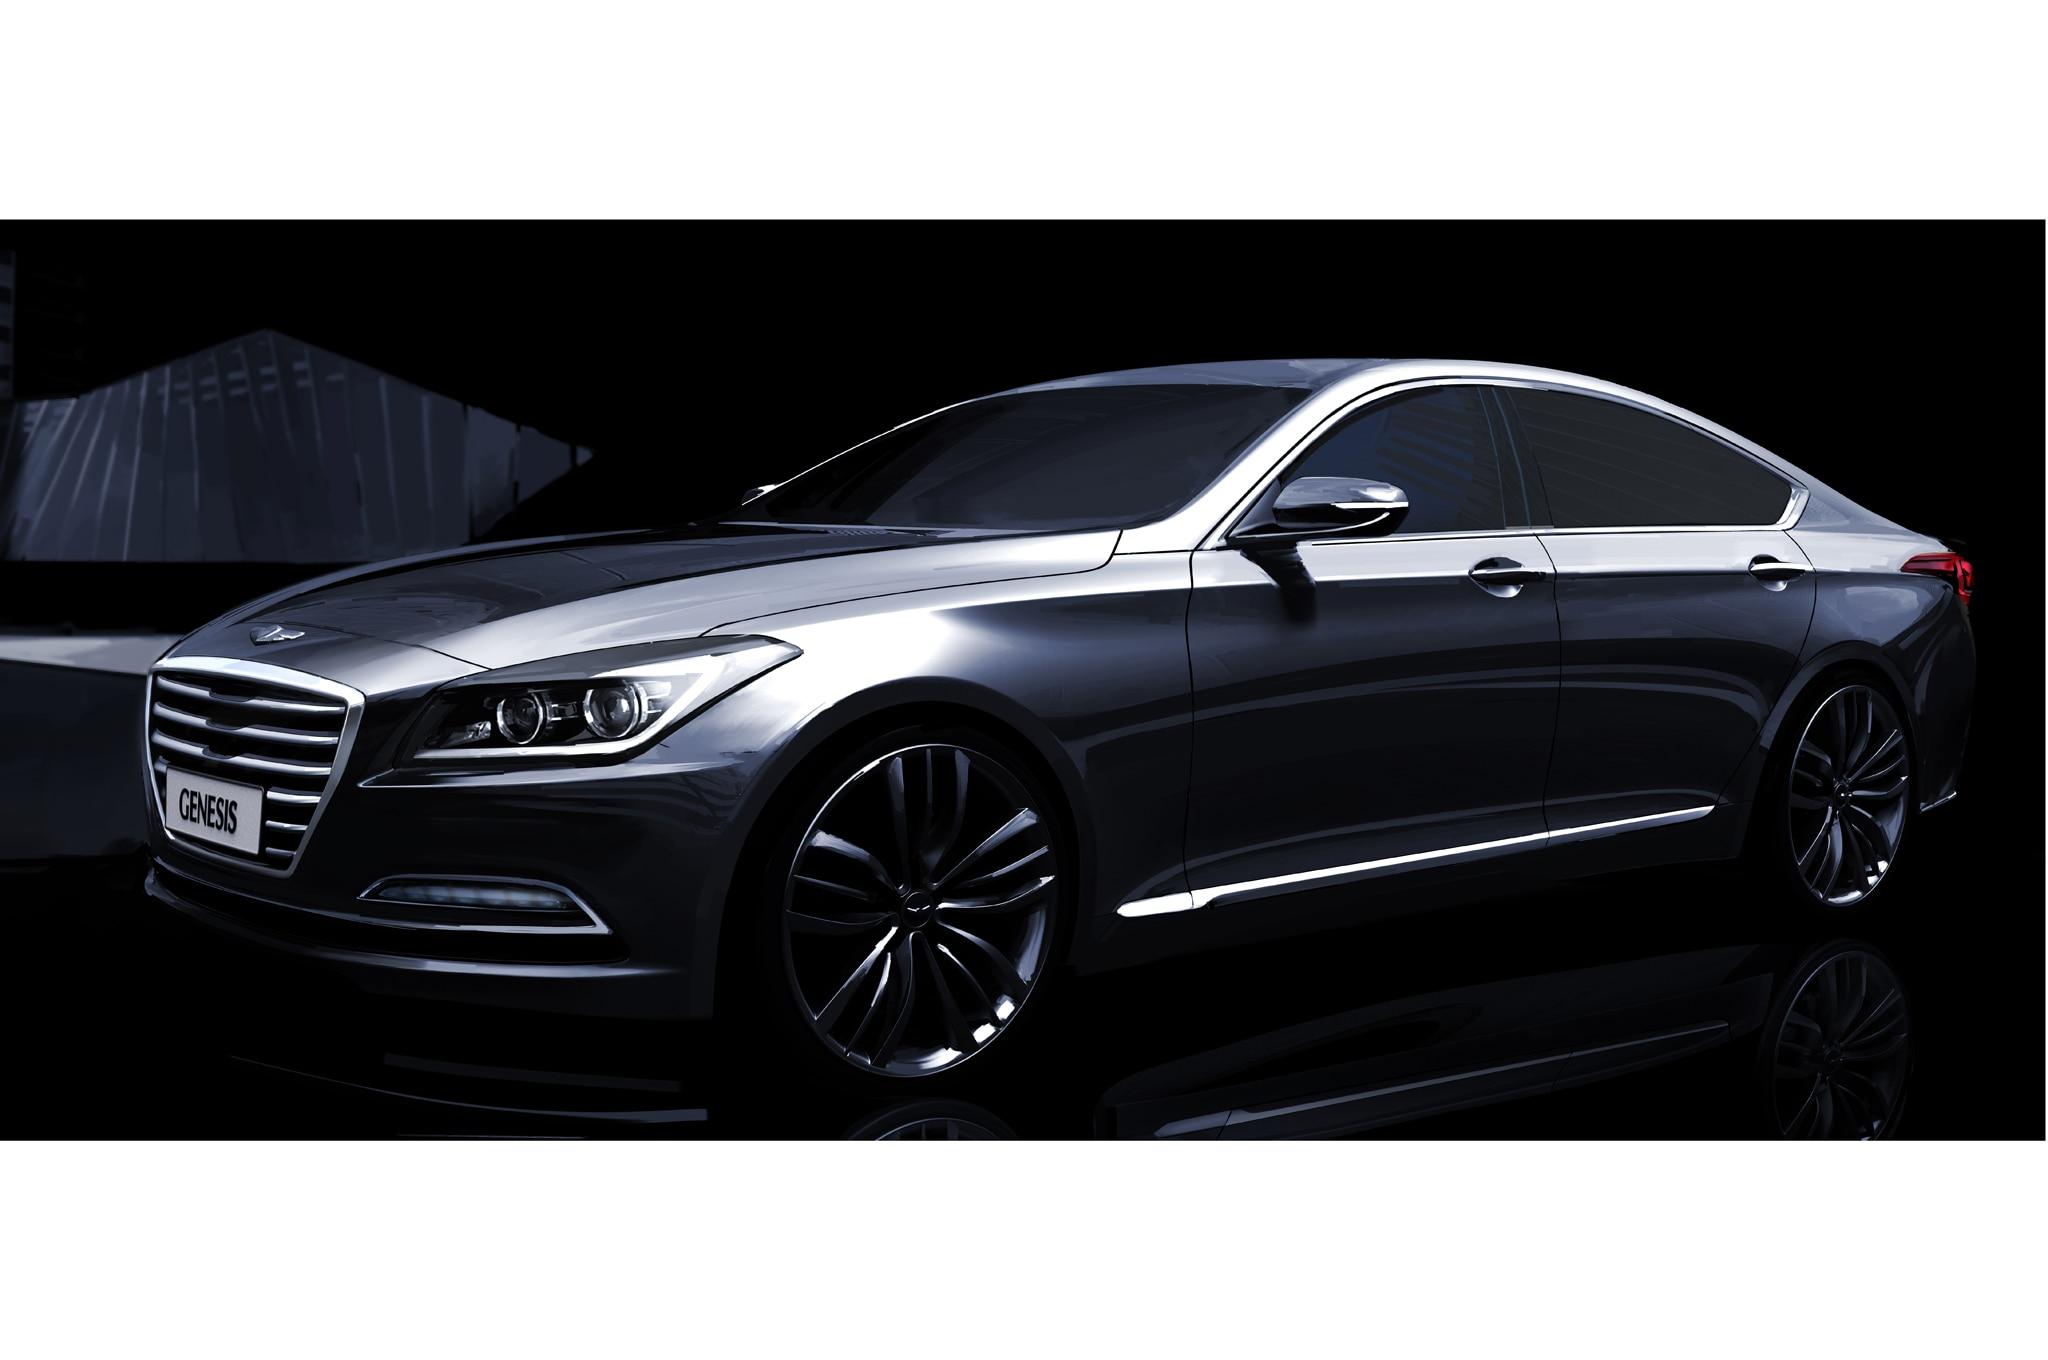 2015 Hyundai Genesis Sketch Front Three Quarter1